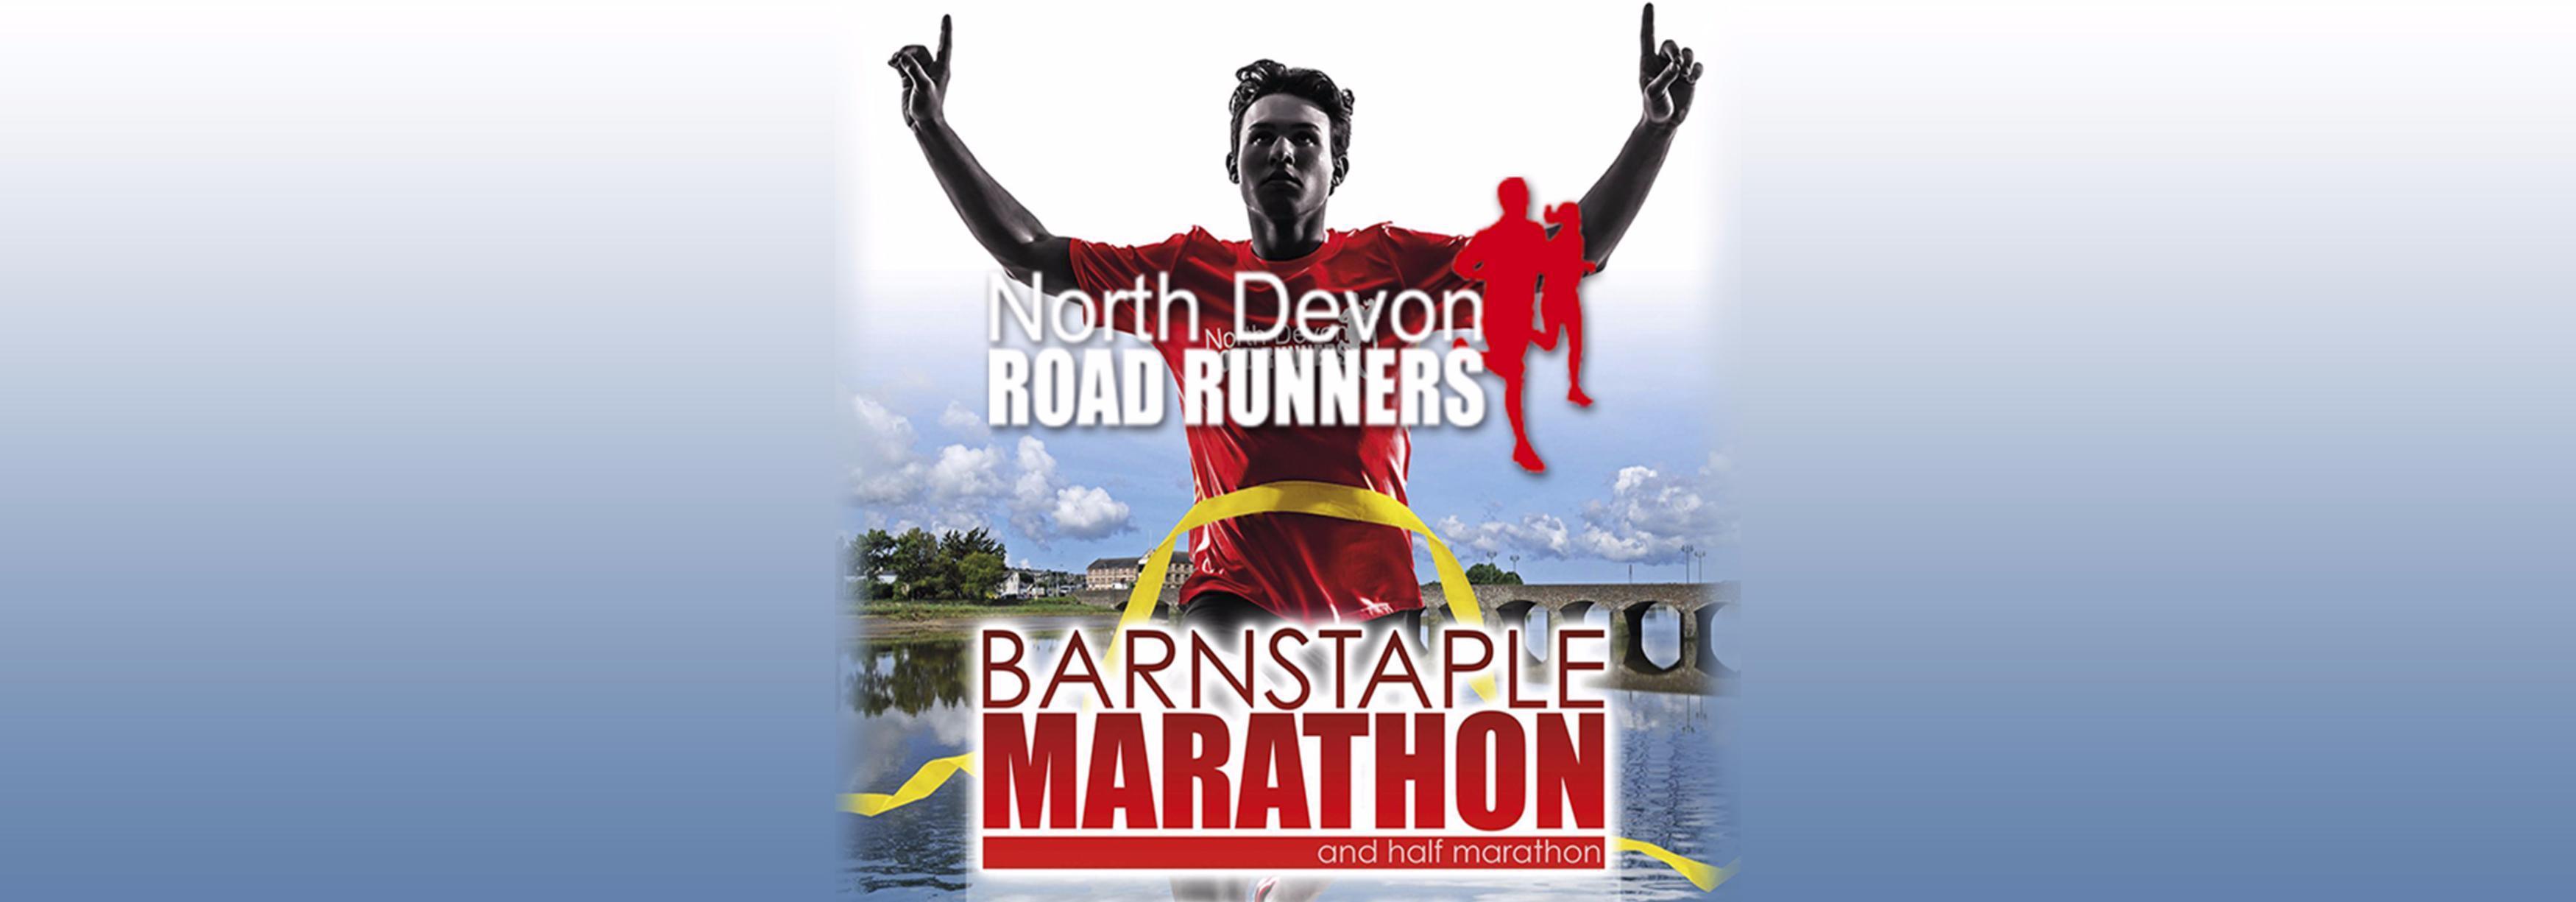 north devon road runners myclubhouse